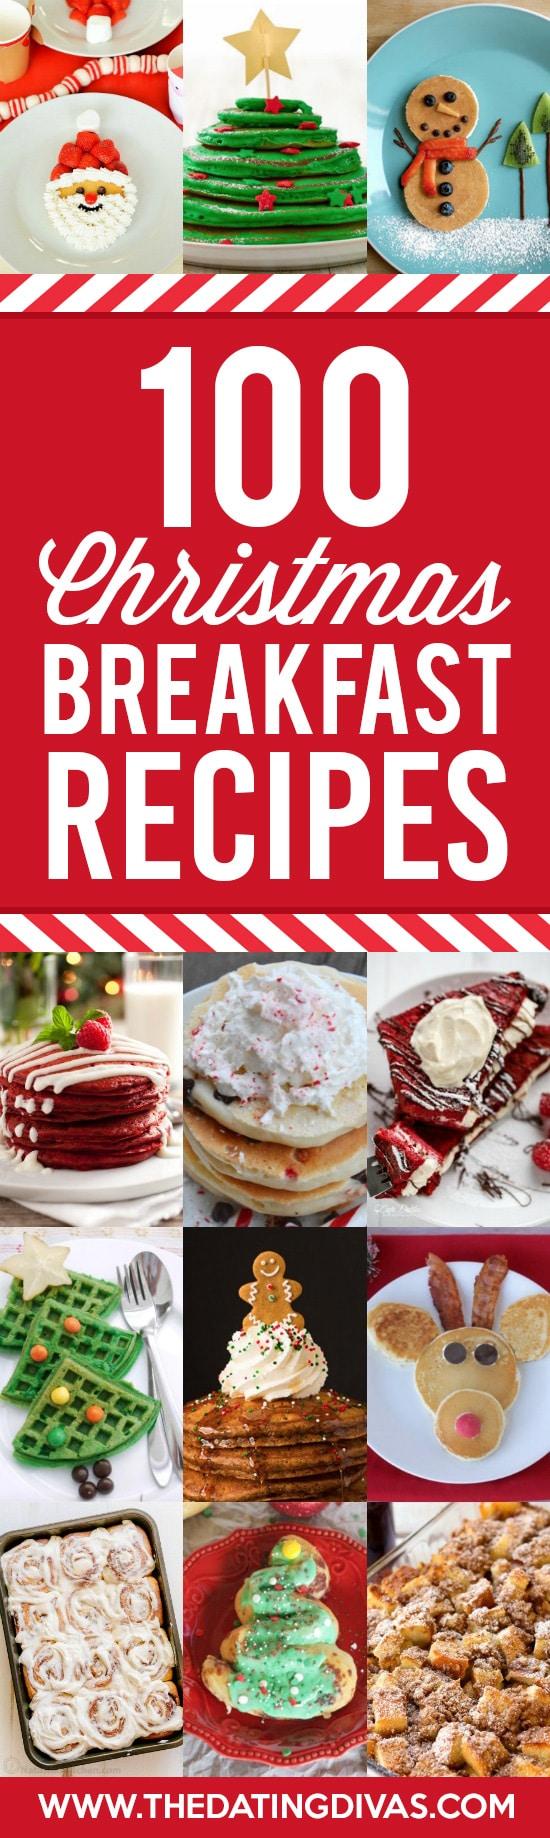 Favorite Christmas Breakfast Recipes